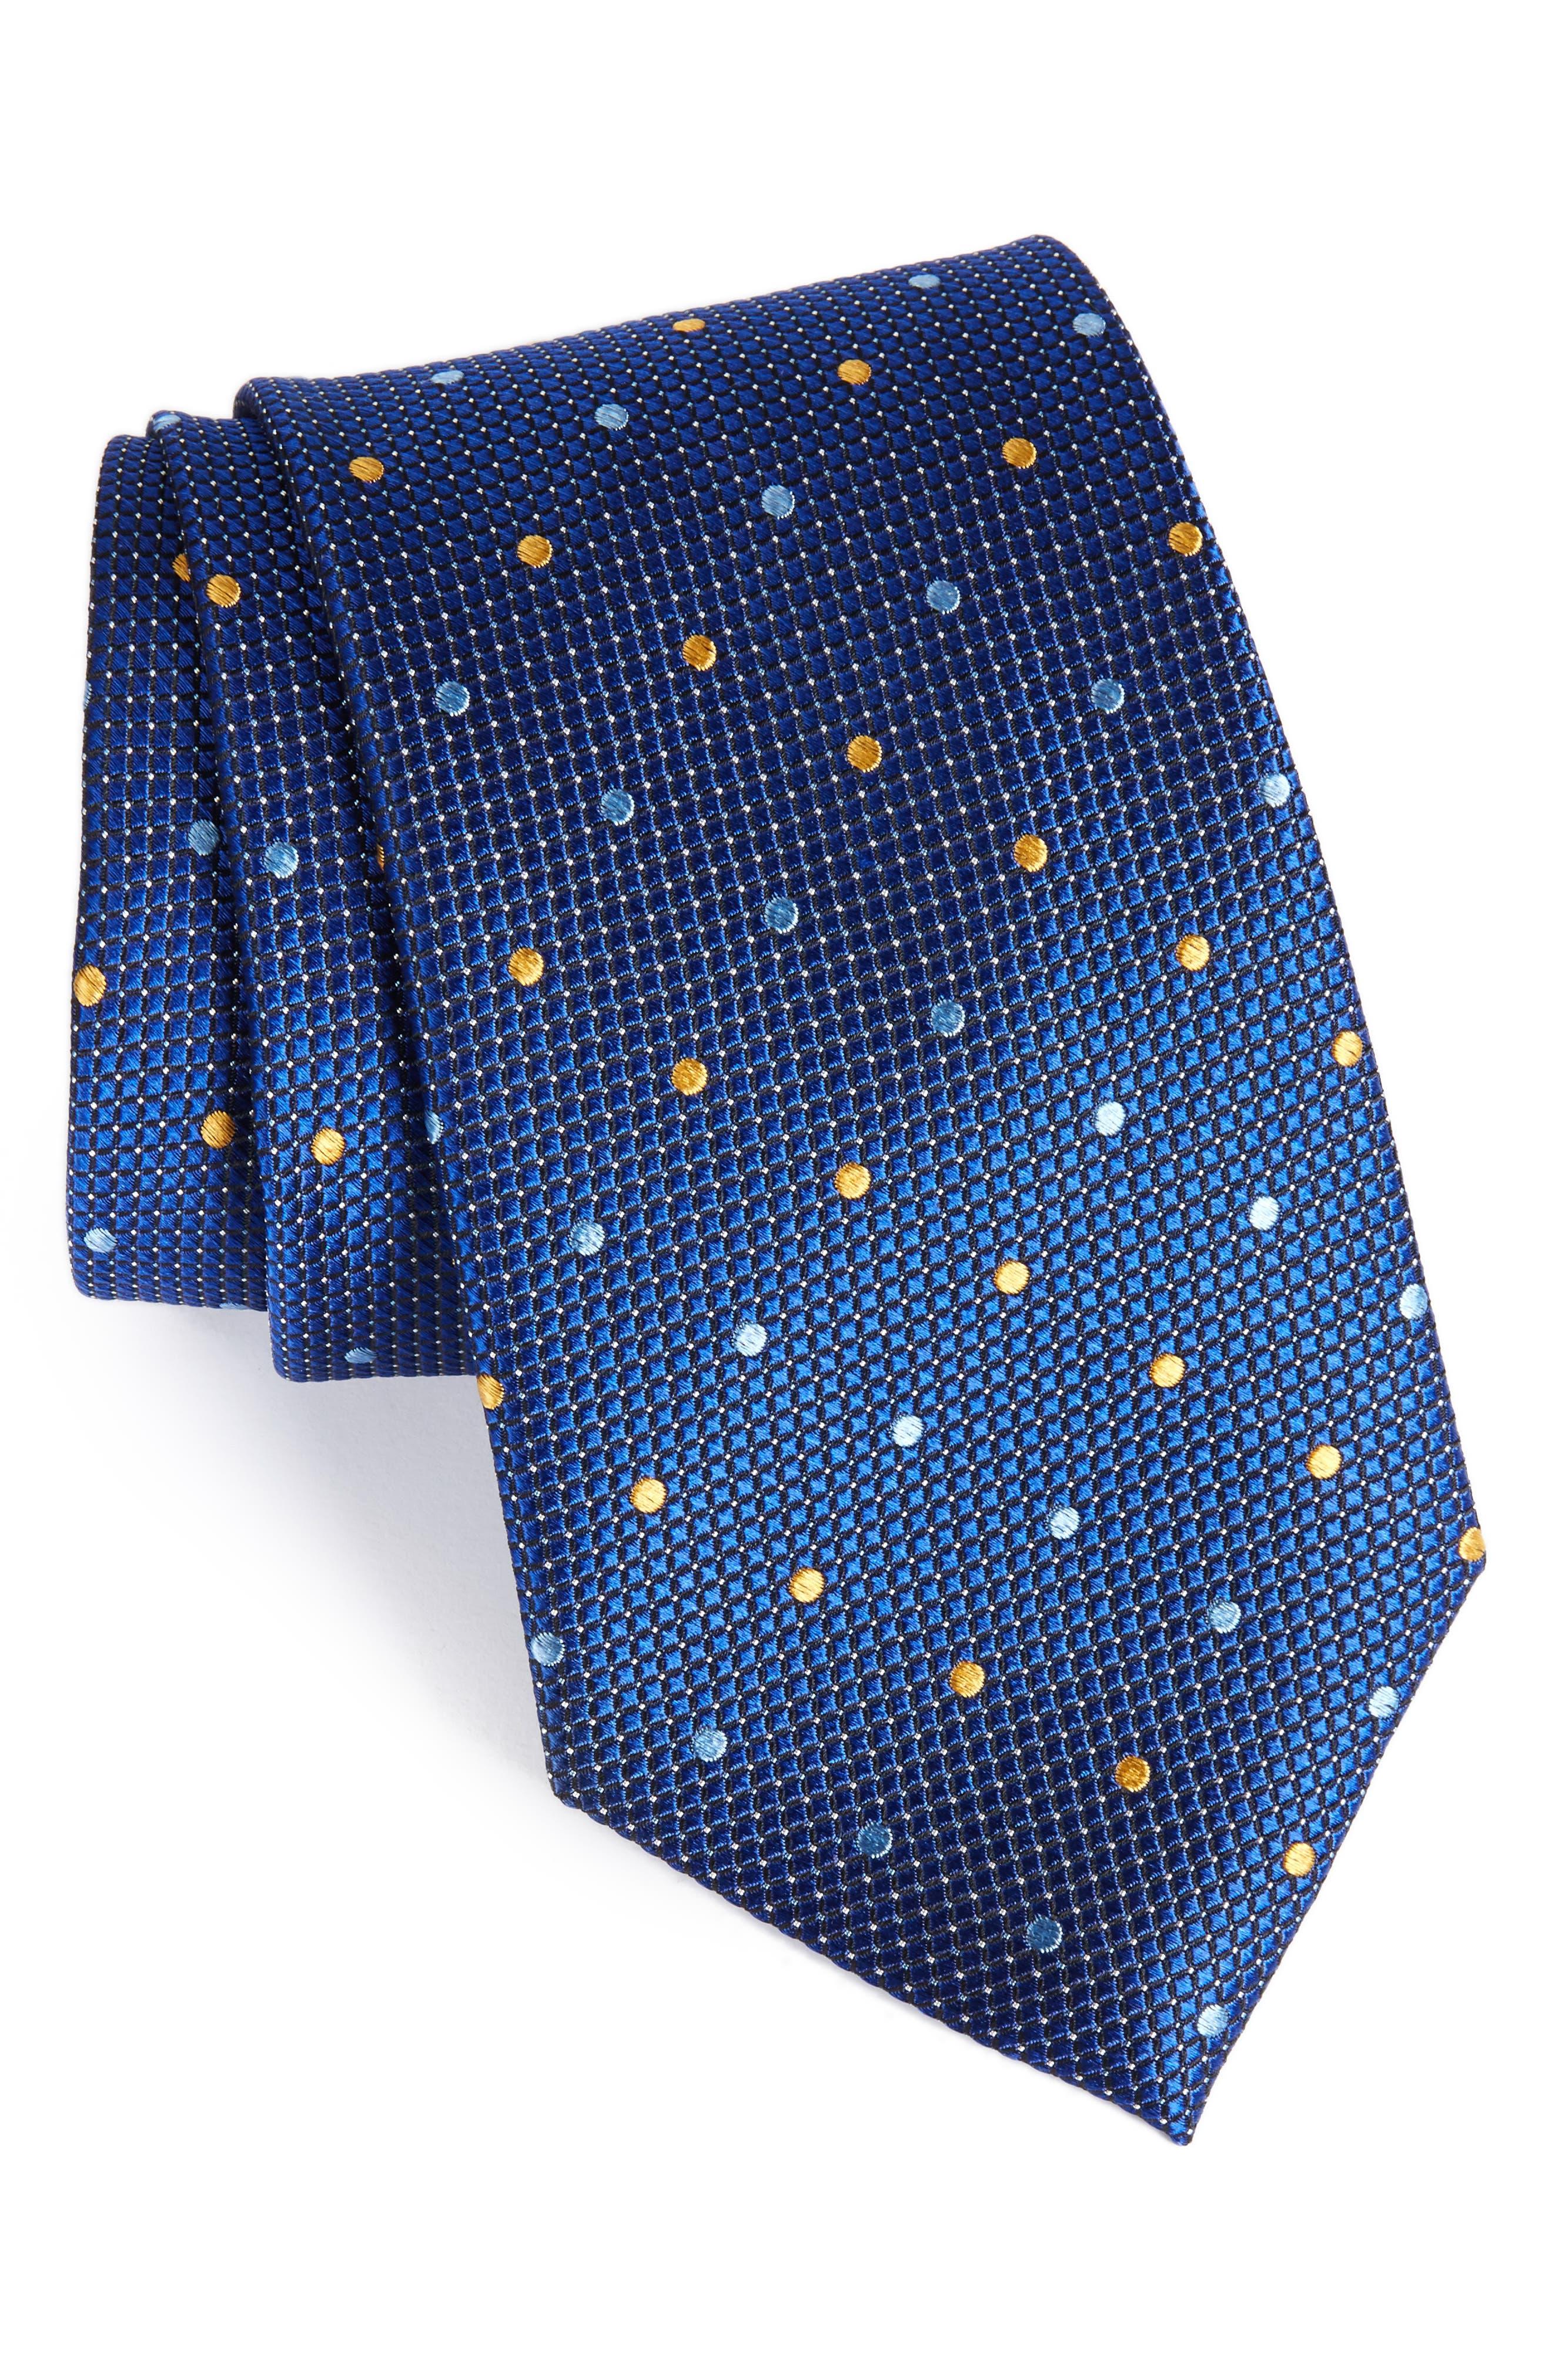 Graphic Dots Silk Tie,                             Main thumbnail 1, color,                             Navy